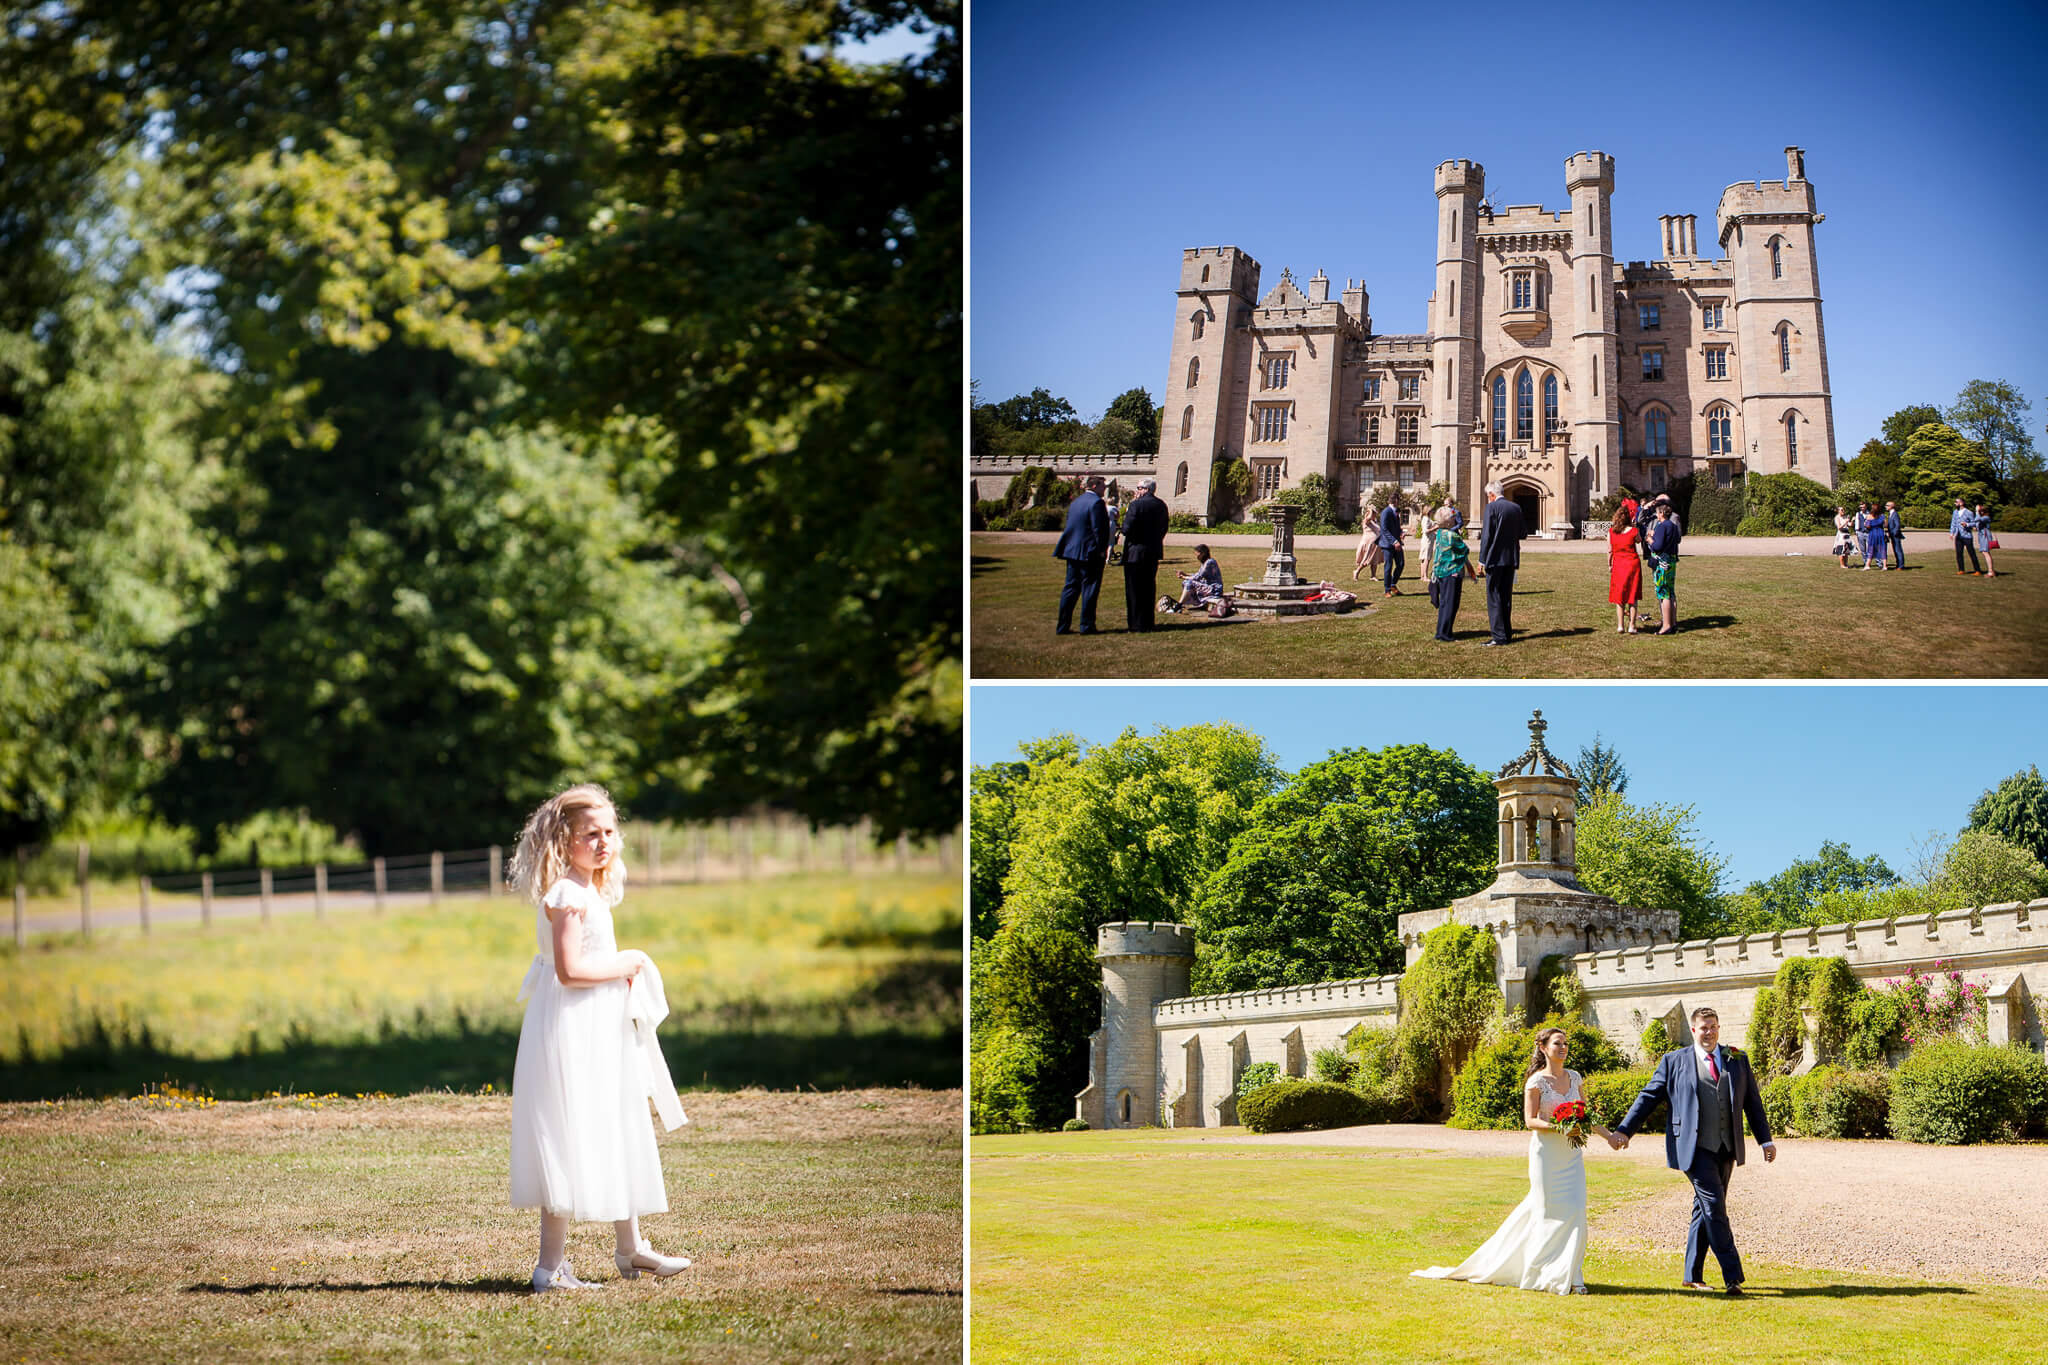 duns-castle-wedding-photograper-scotland-stanbury-photography-014